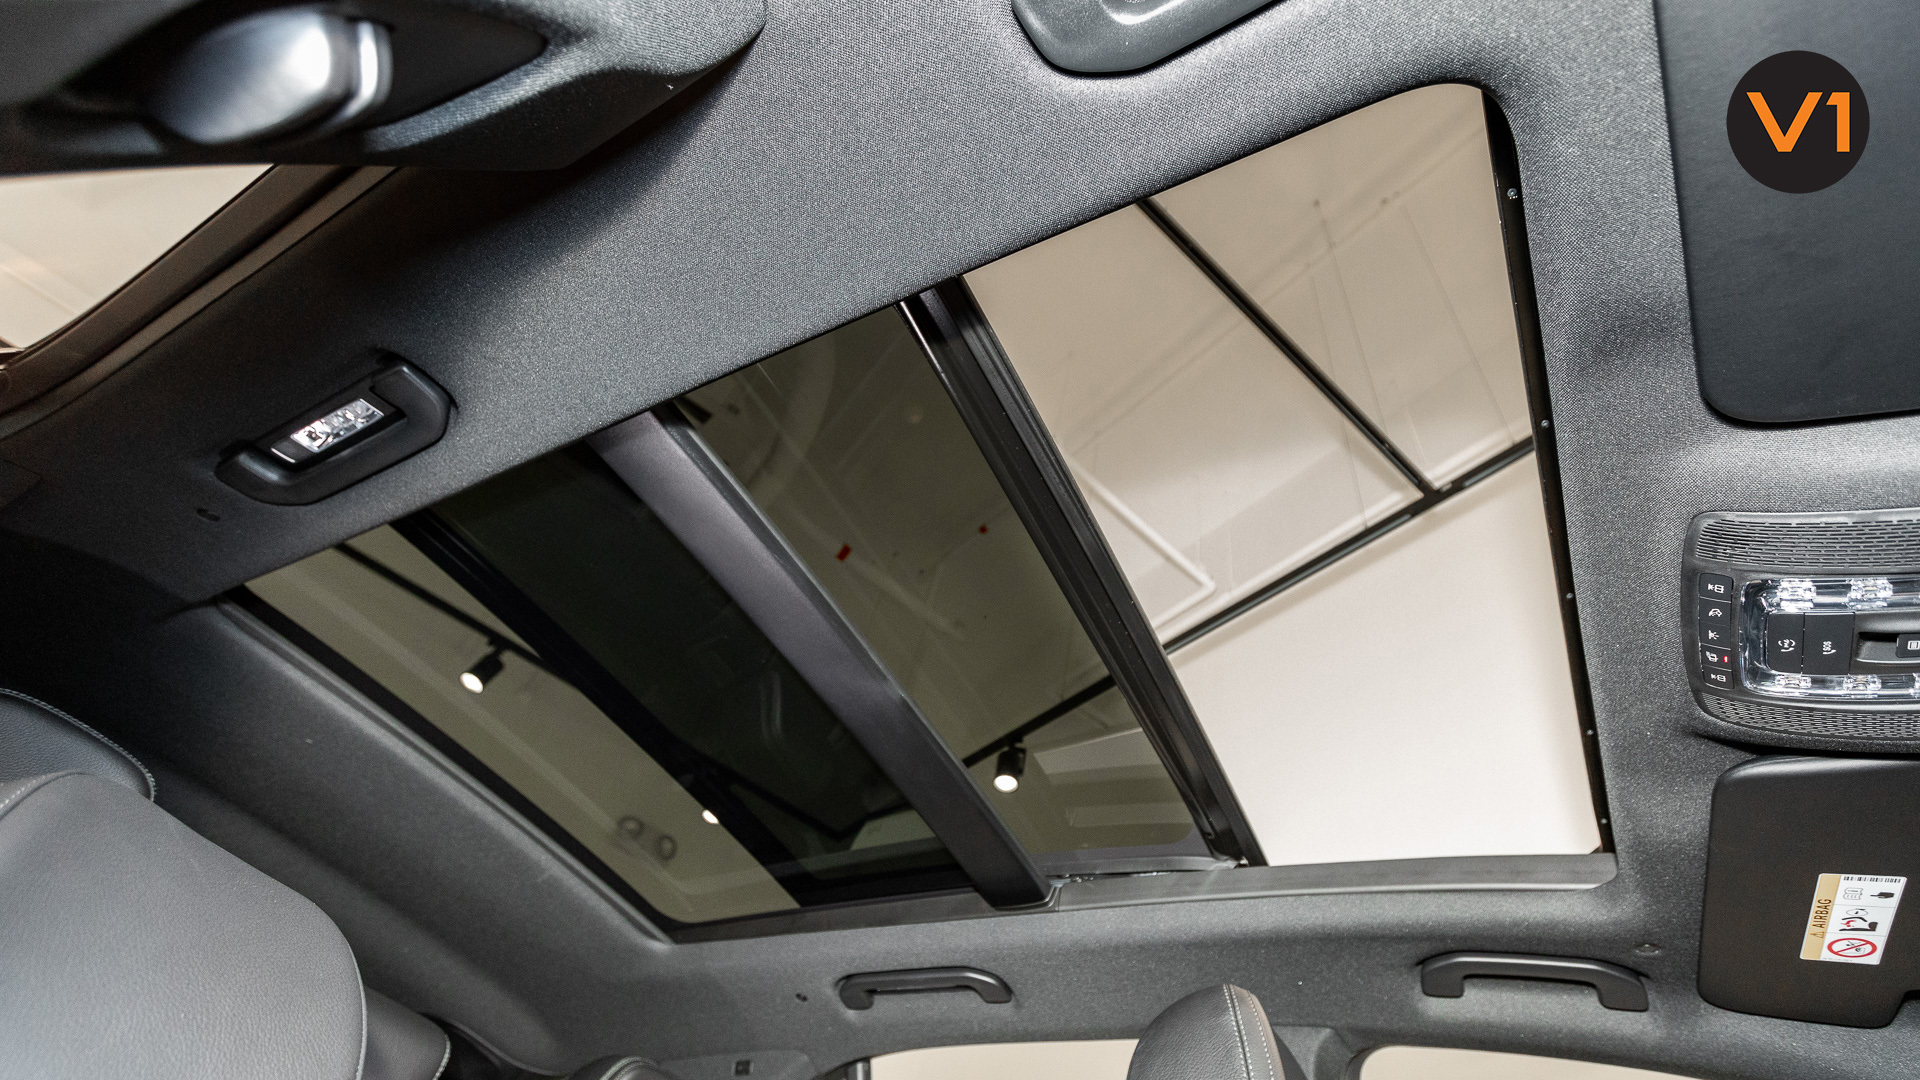 MERCEDES-BENZ GLE450 AMG 4MATIC LUXURY - Panoramic sliding sunroof